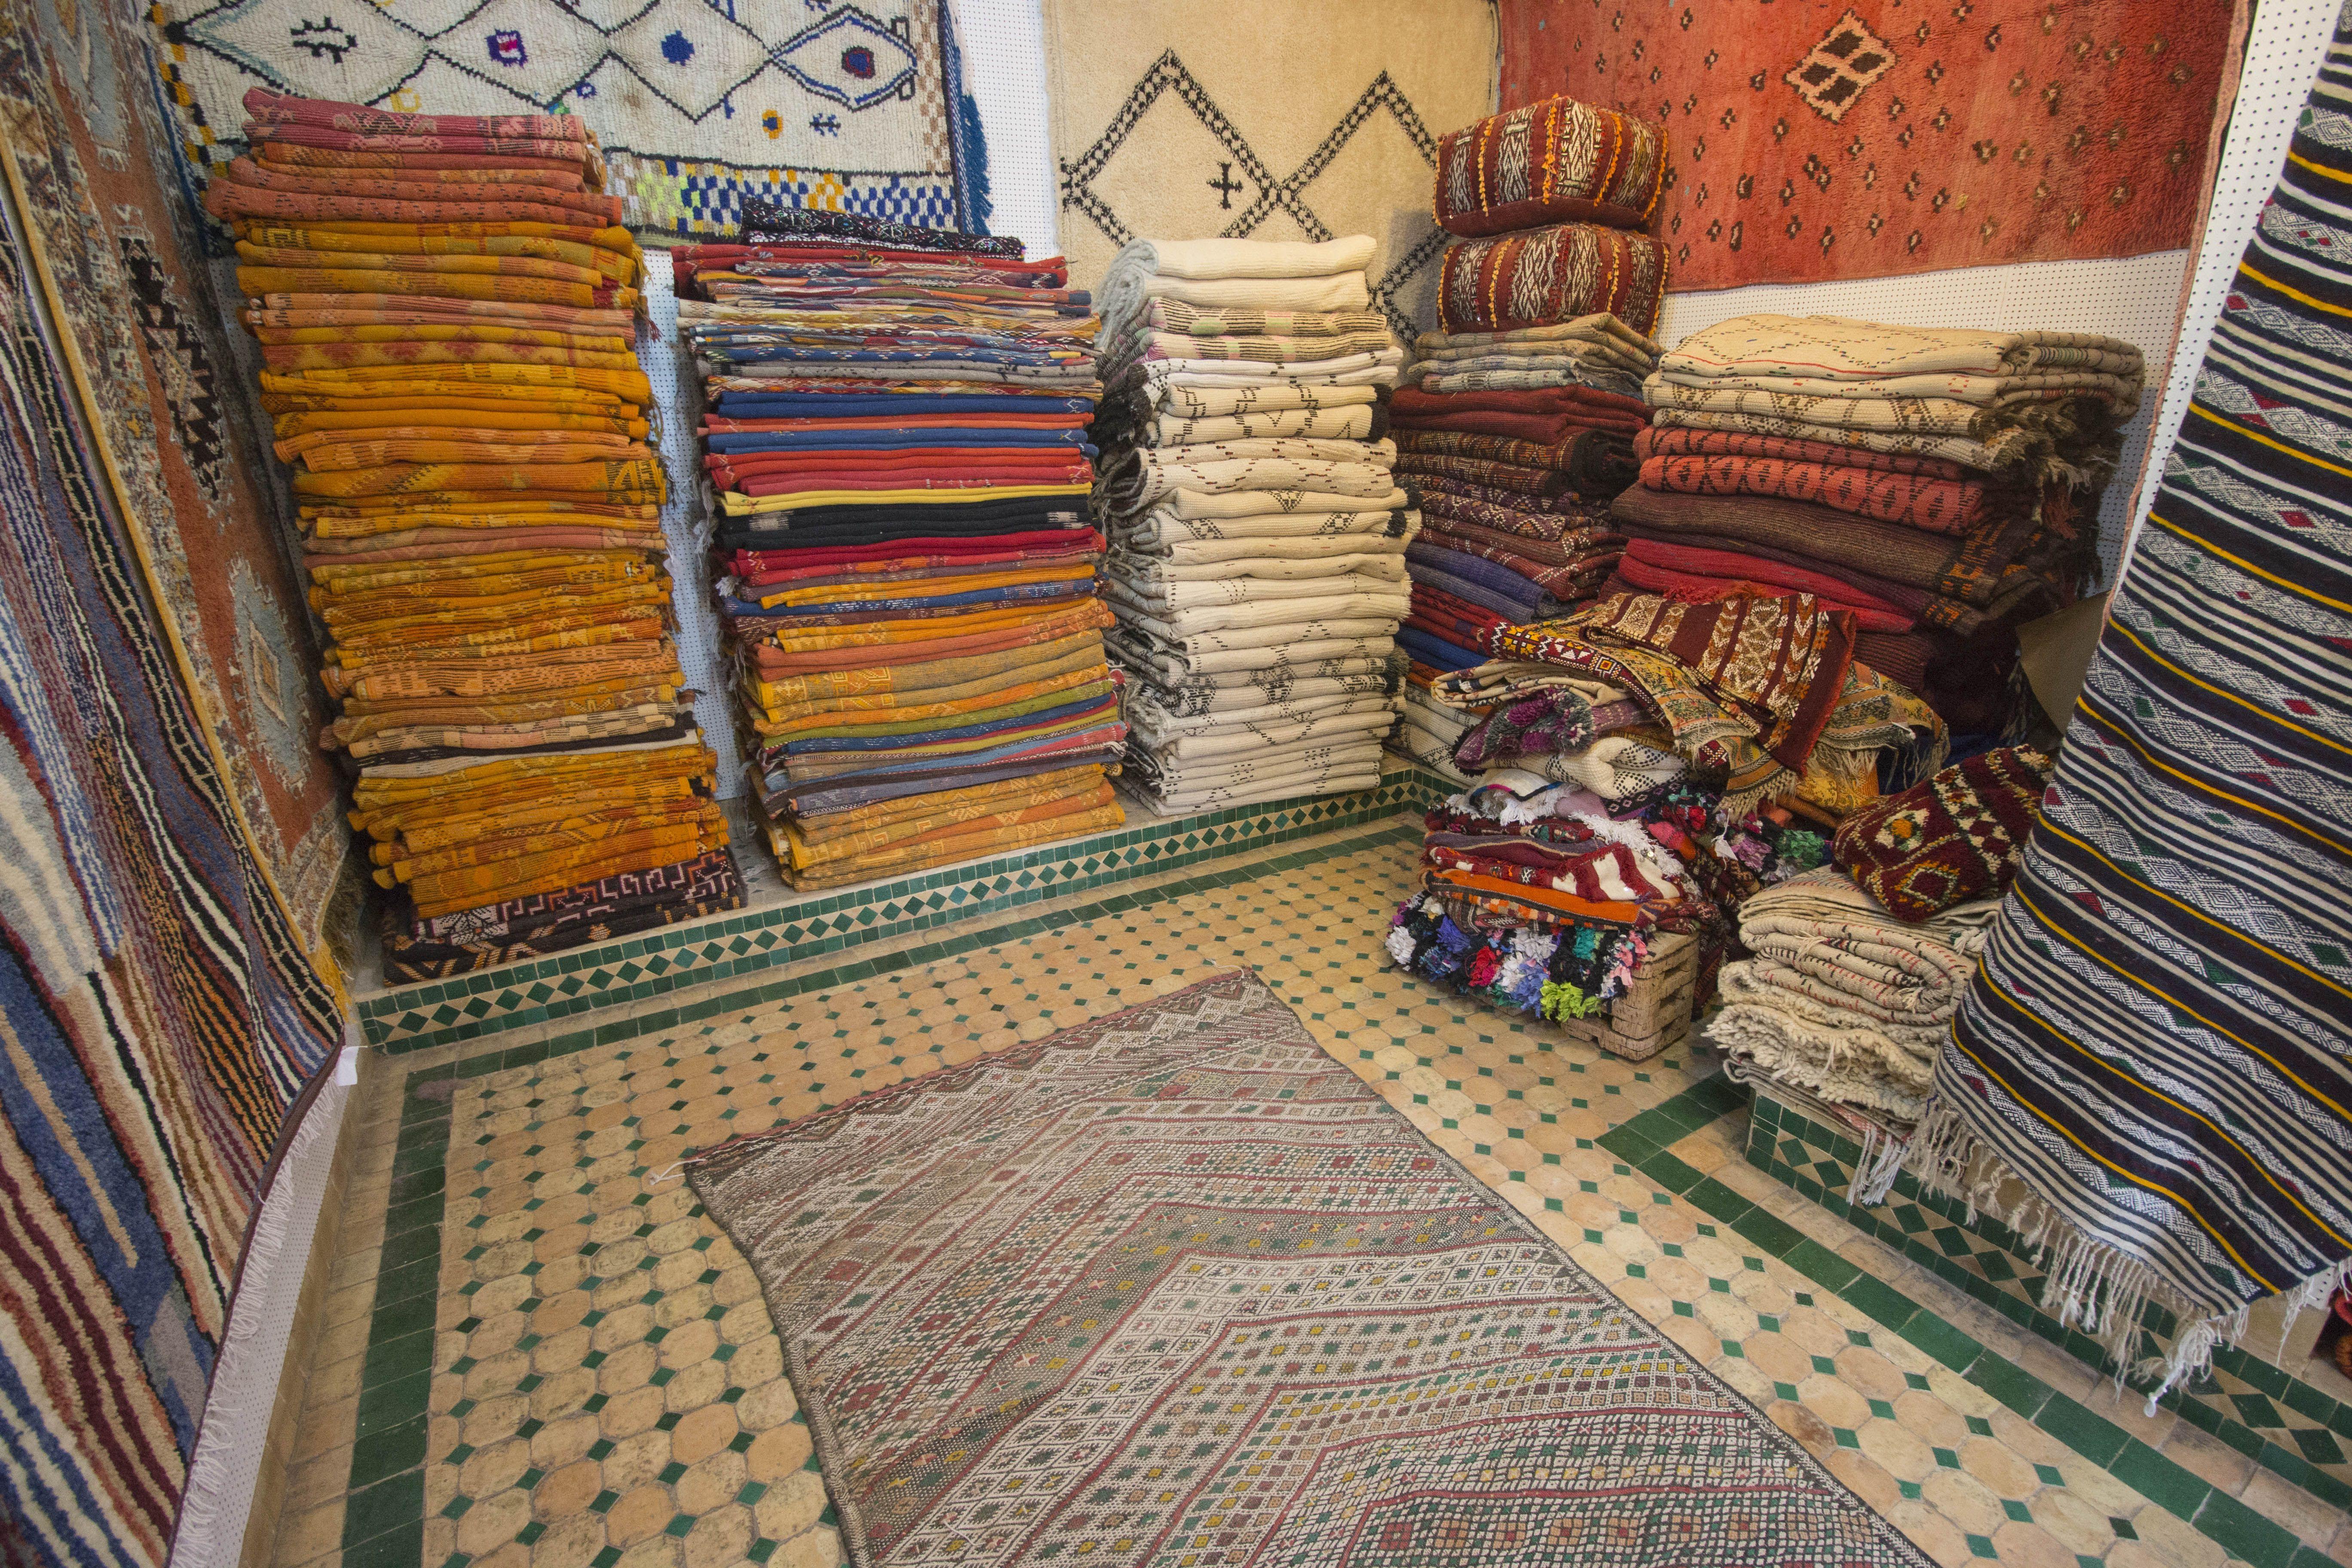 Carpet merchant in Morocco